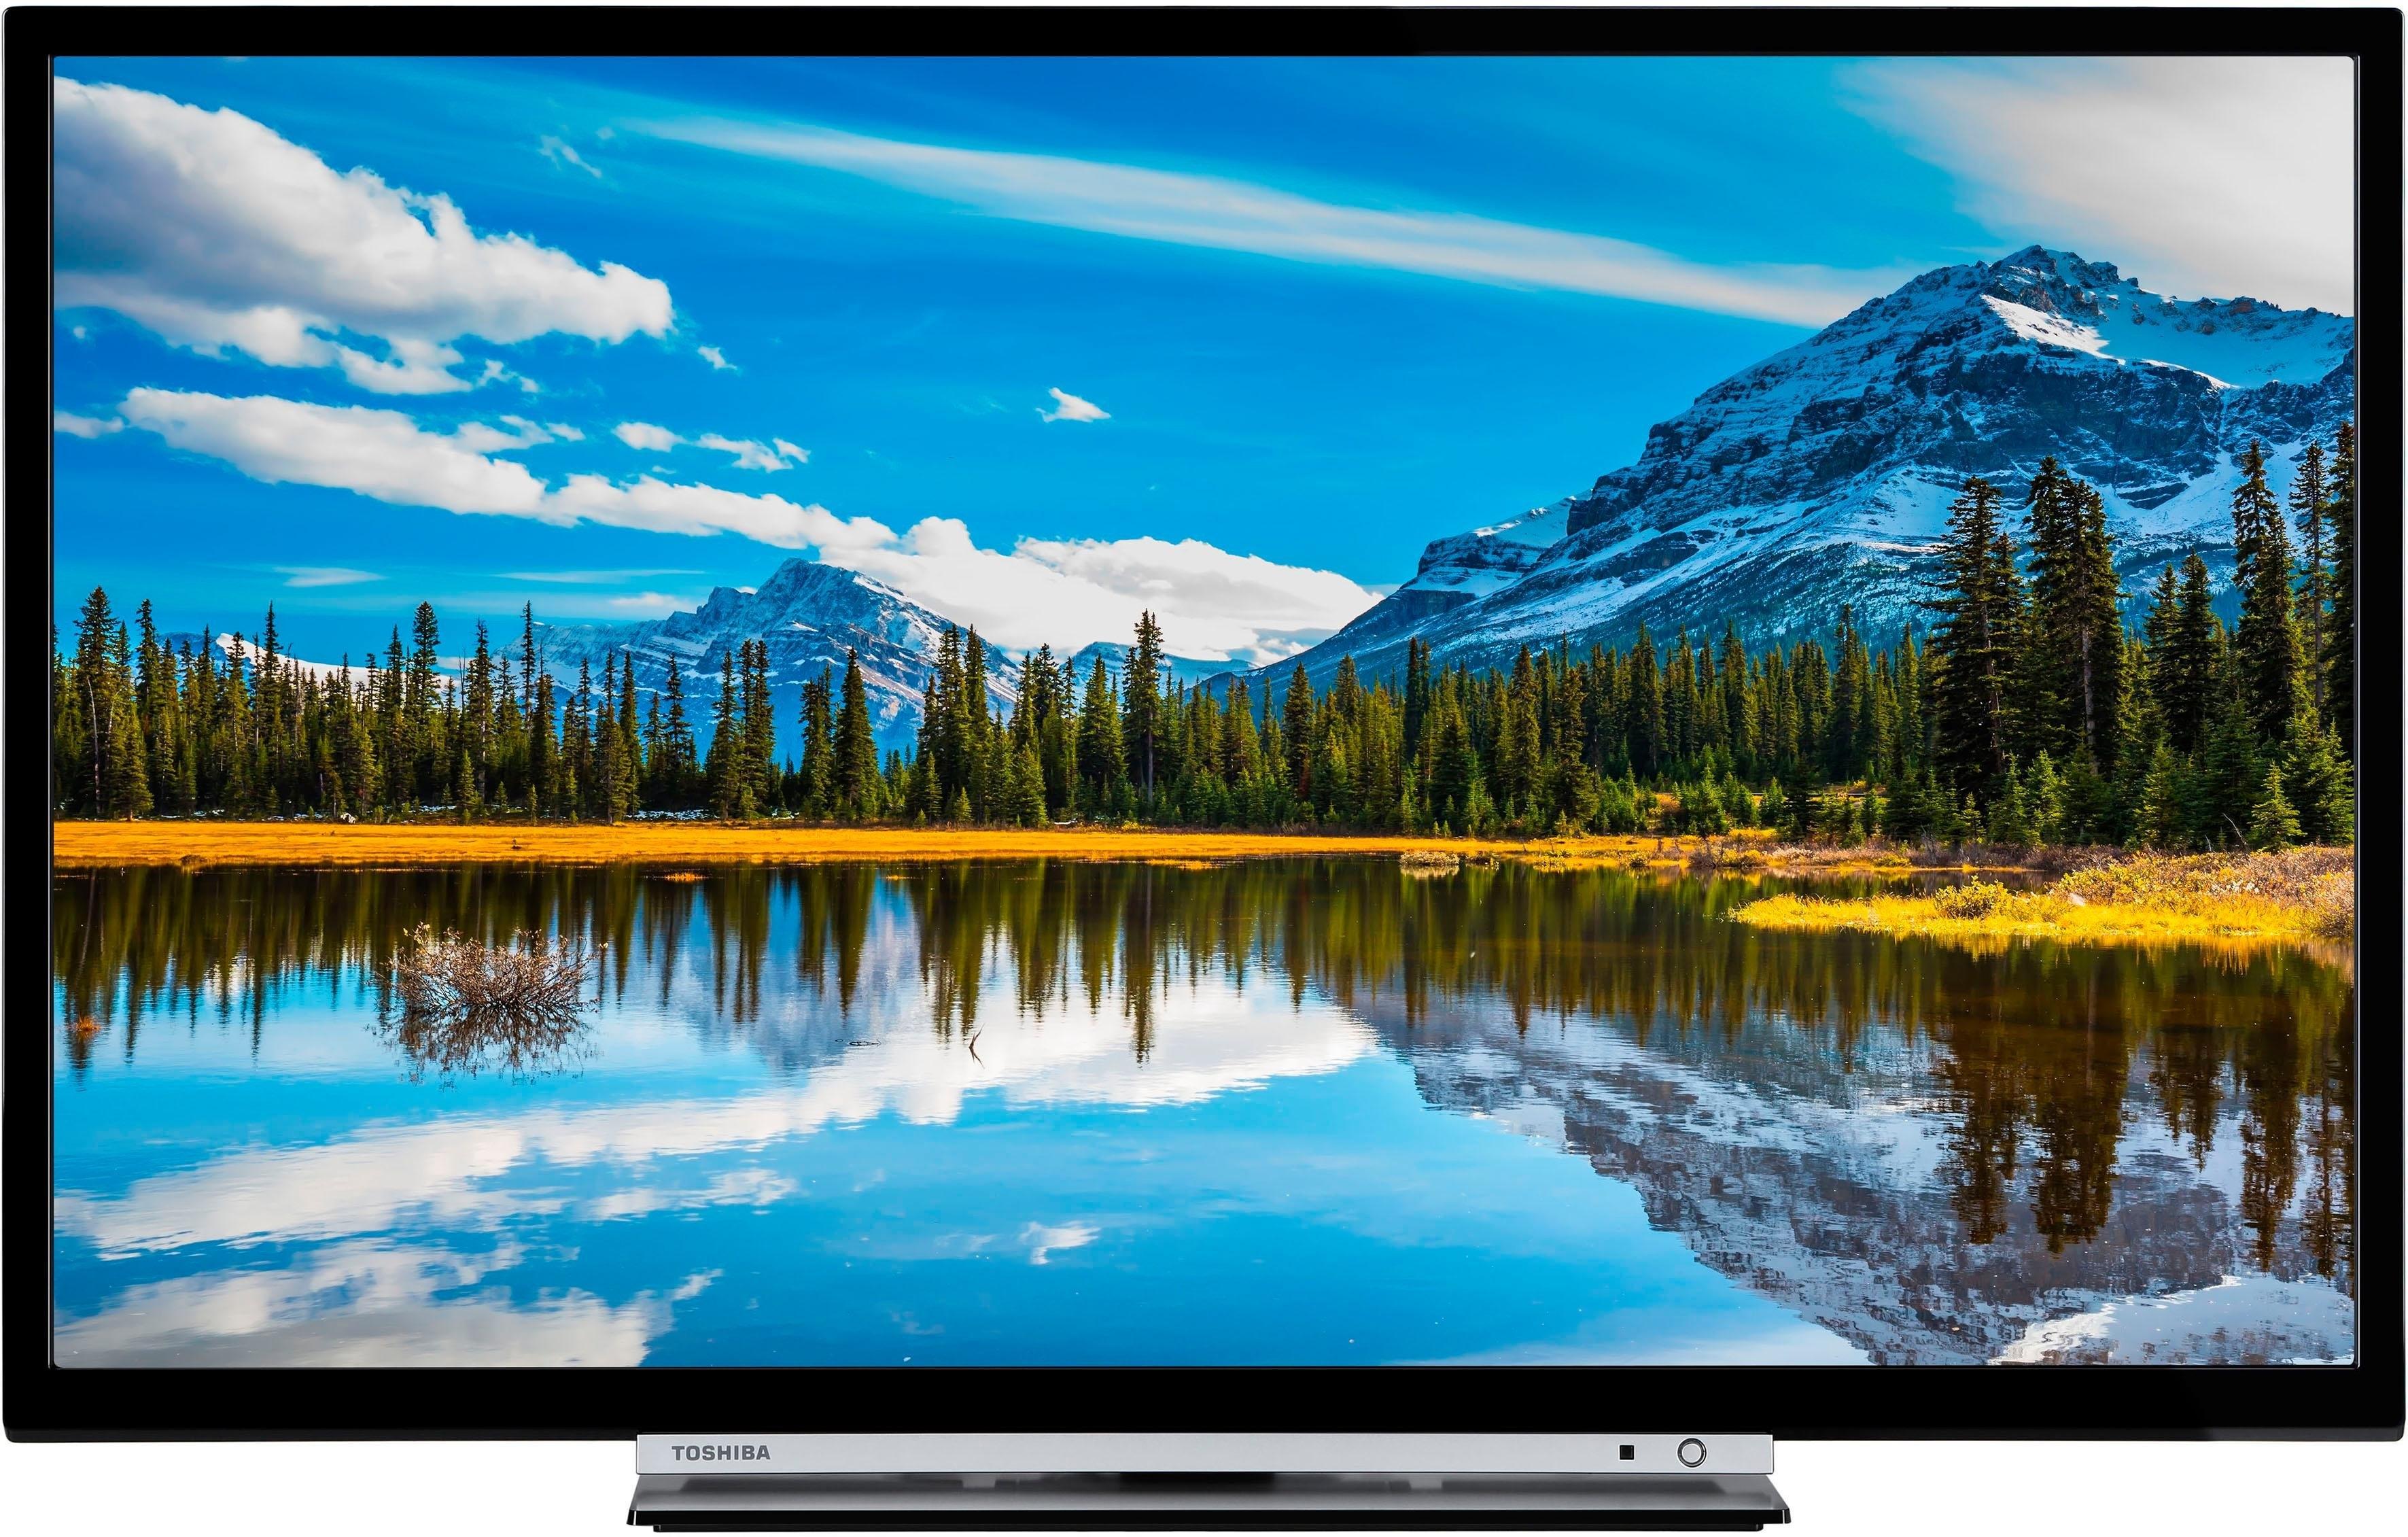 Toshiba 32L3863DA led-tv (81 cm / (32 inch)), Full HD, smart-tv goedkoop op otto.nl kopen